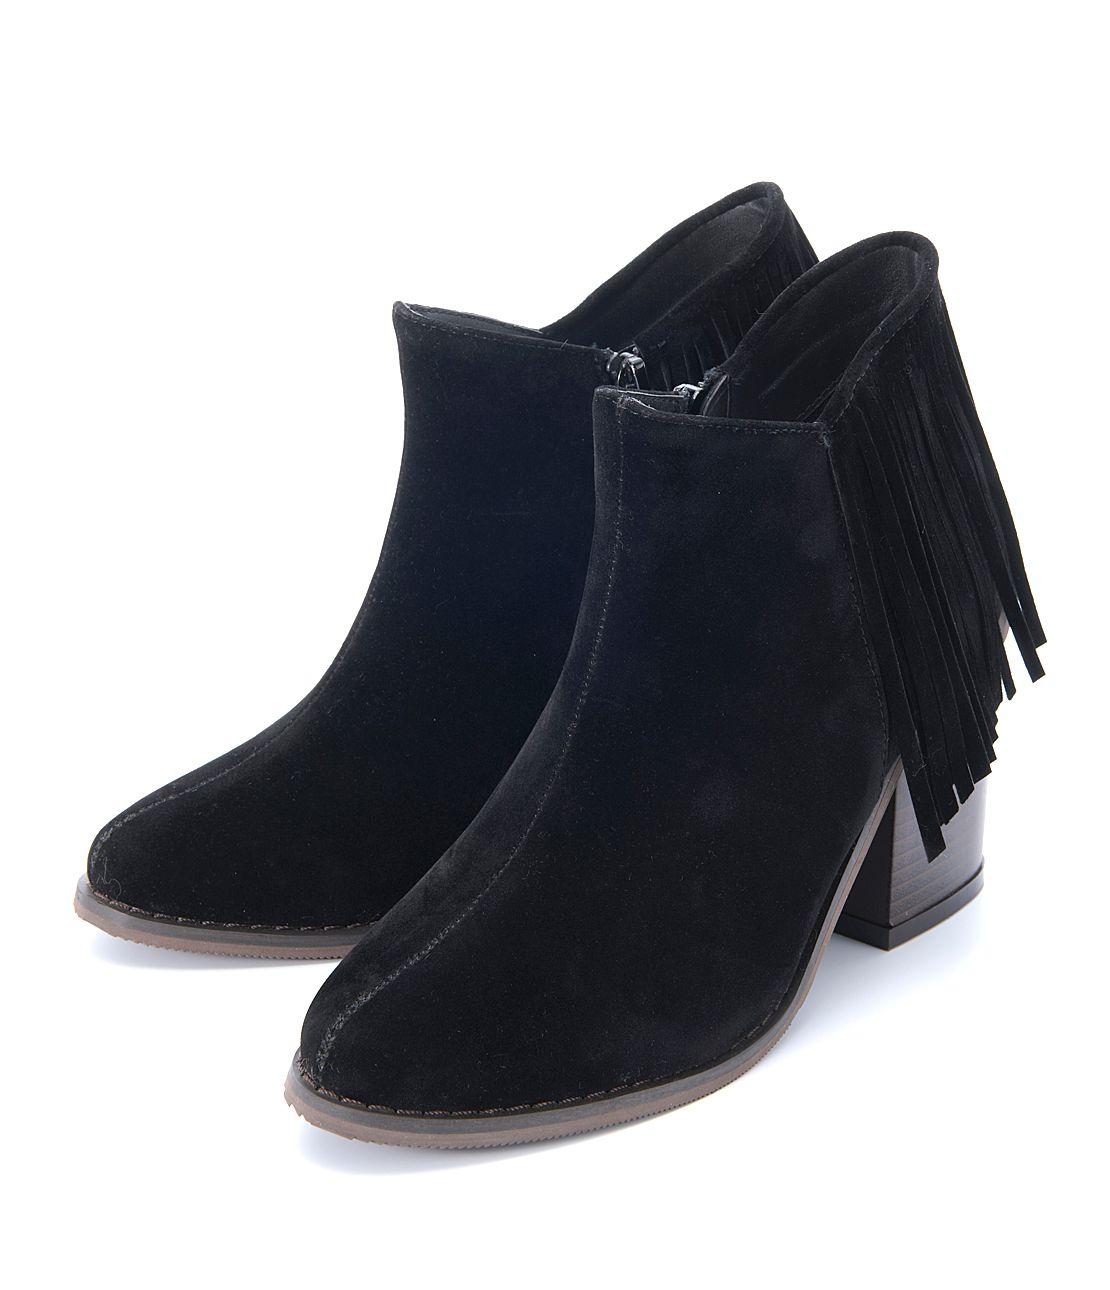 Fringe Short Boots